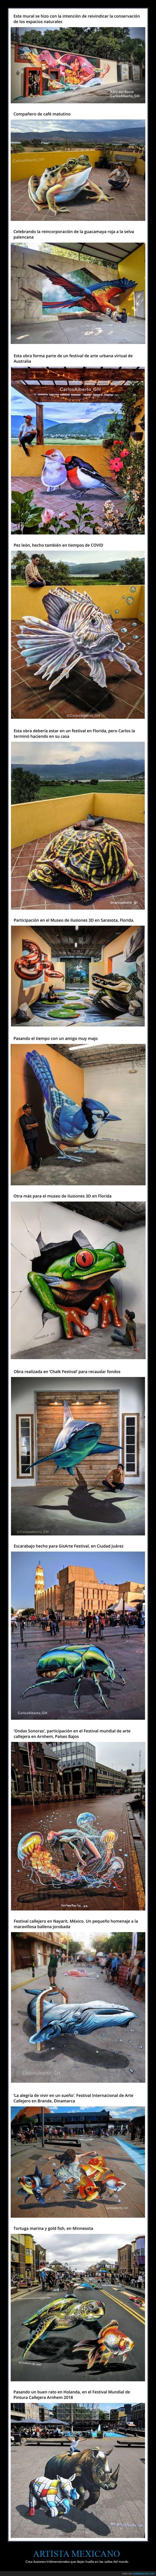 arte,carlos alberto gh,tridimensional